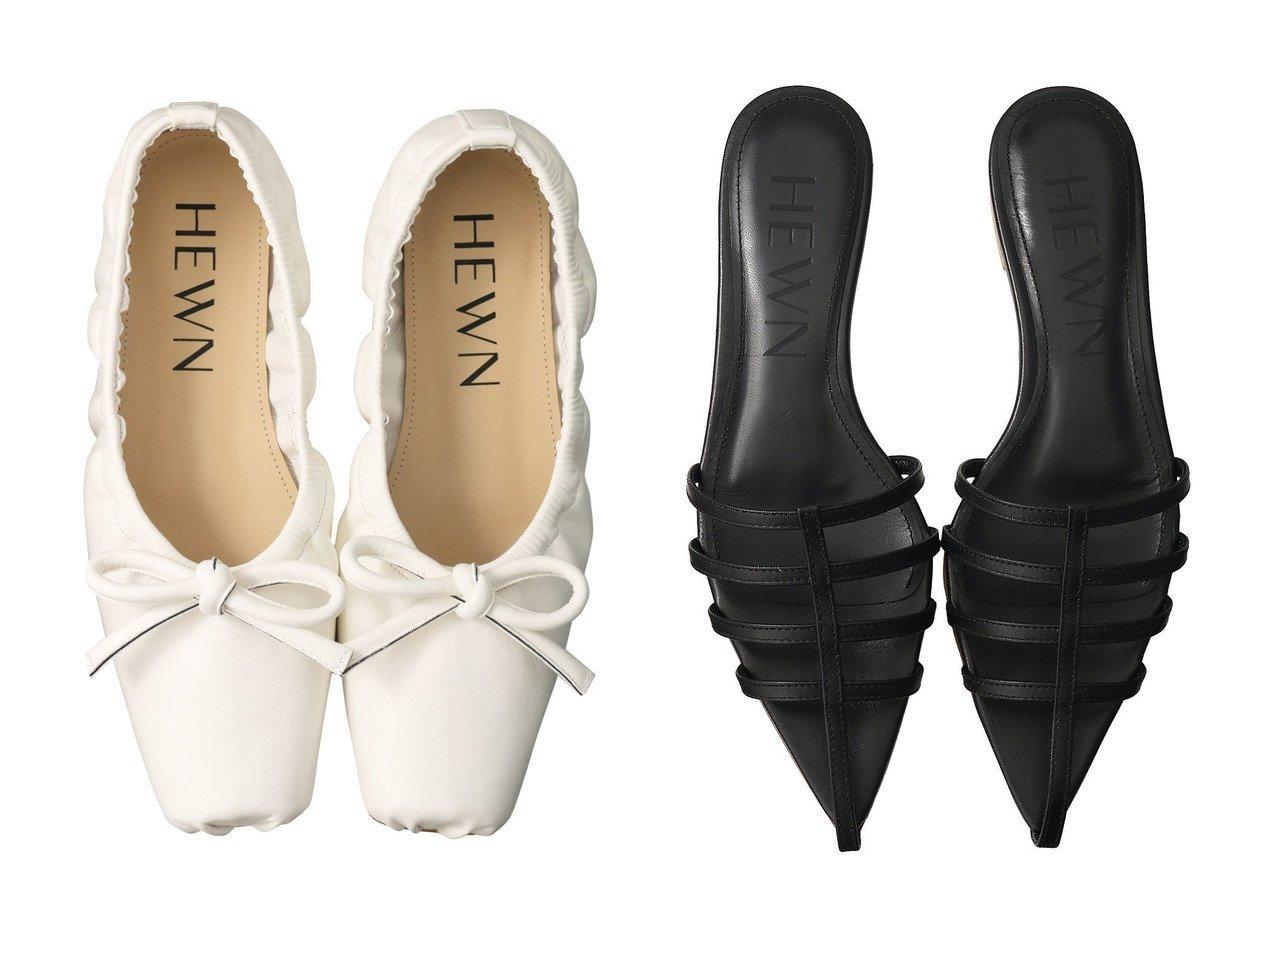 【HEWN/ヒューン】のポインテッドトゥストラップミュール&スクエアトゥバレエシューズ シューズ・靴のおすすめ!人気、トレンド・レディースファッションの通販 おすすめで人気の流行・トレンド、ファッションの通販商品 メンズファッション・キッズファッション・インテリア・家具・レディースファッション・服の通販 founy(ファニー) https://founy.com/ ファッション Fashion レディースファッション WOMEN 2021年 2021 2021 春夏 S/S SS Spring/Summer 2021 S/S 春夏 SS Spring/Summer シューズ バレエ フラット 春 Spring |ID:crp329100000025021